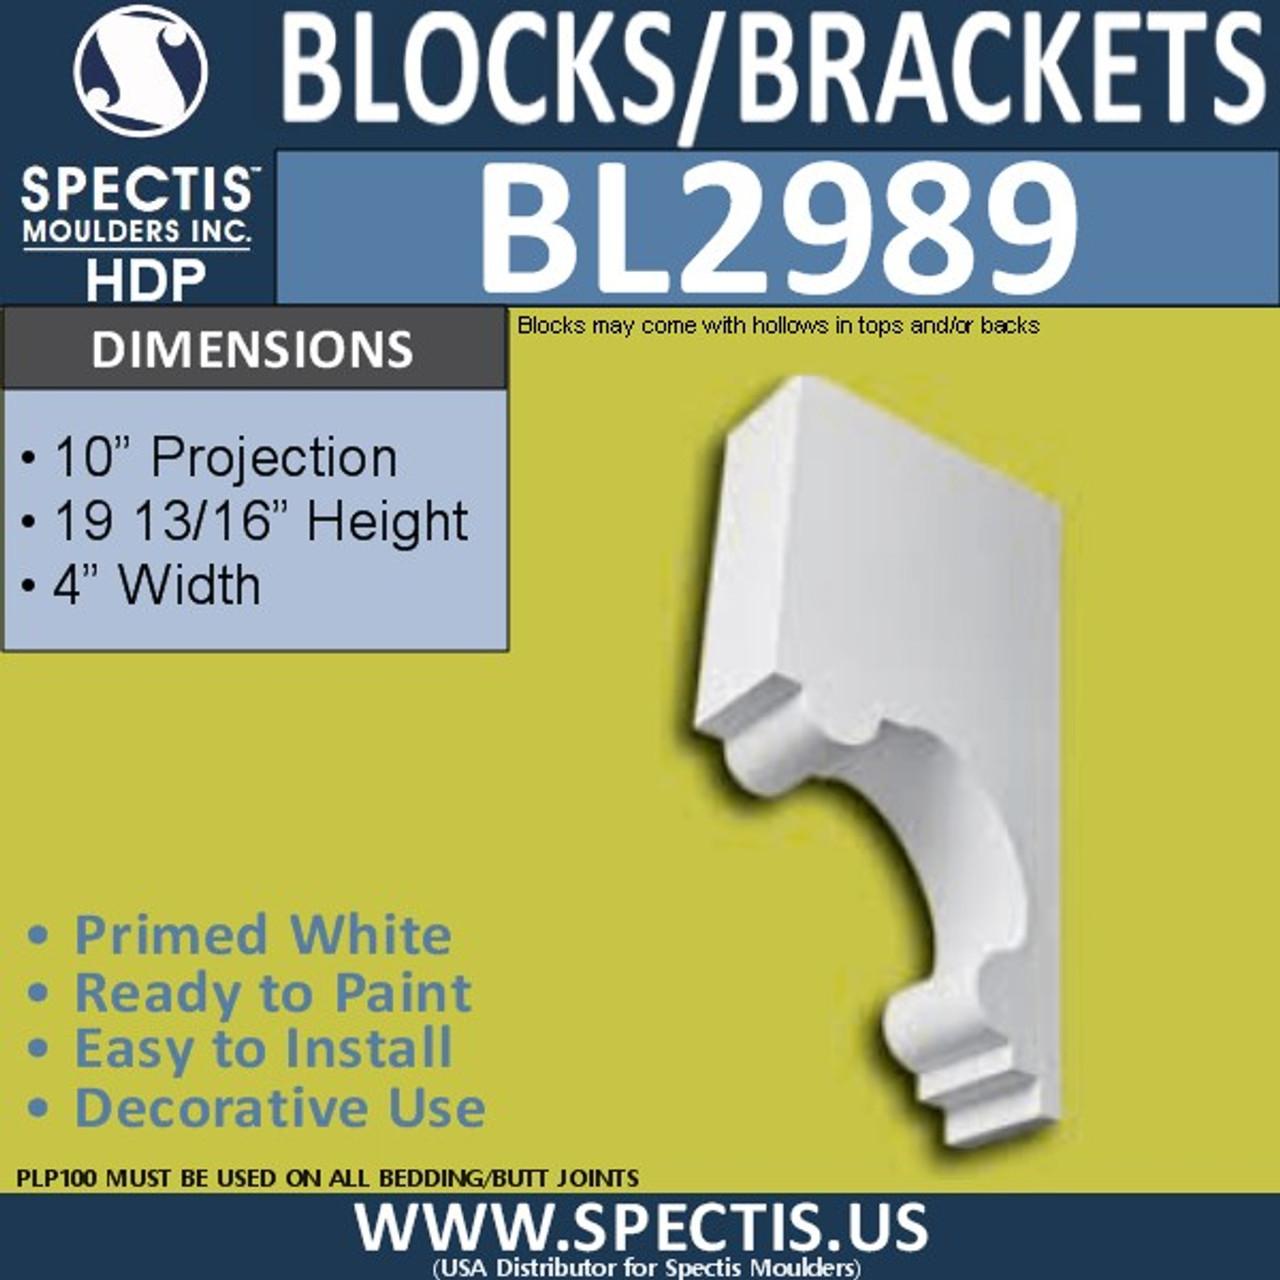 "BL2989 Eave Block or Bracket 4""W x 20""H x 10"" P"